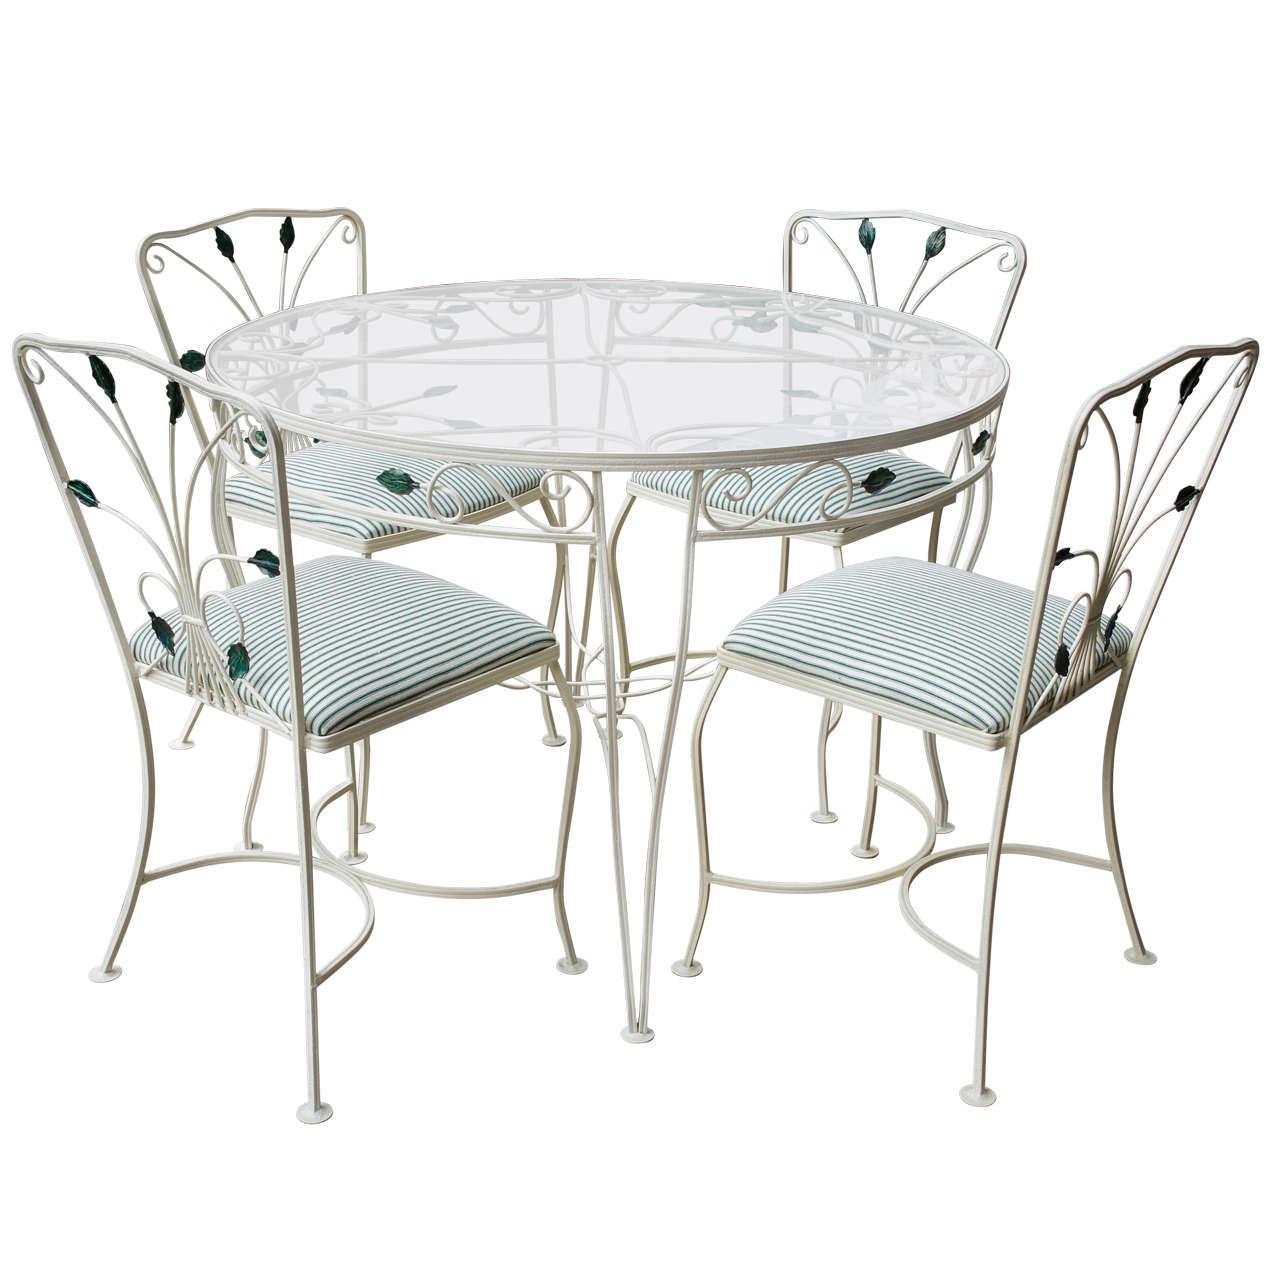 A vintage woodard iron dining set at 1stdibs for Furniture kings lynn